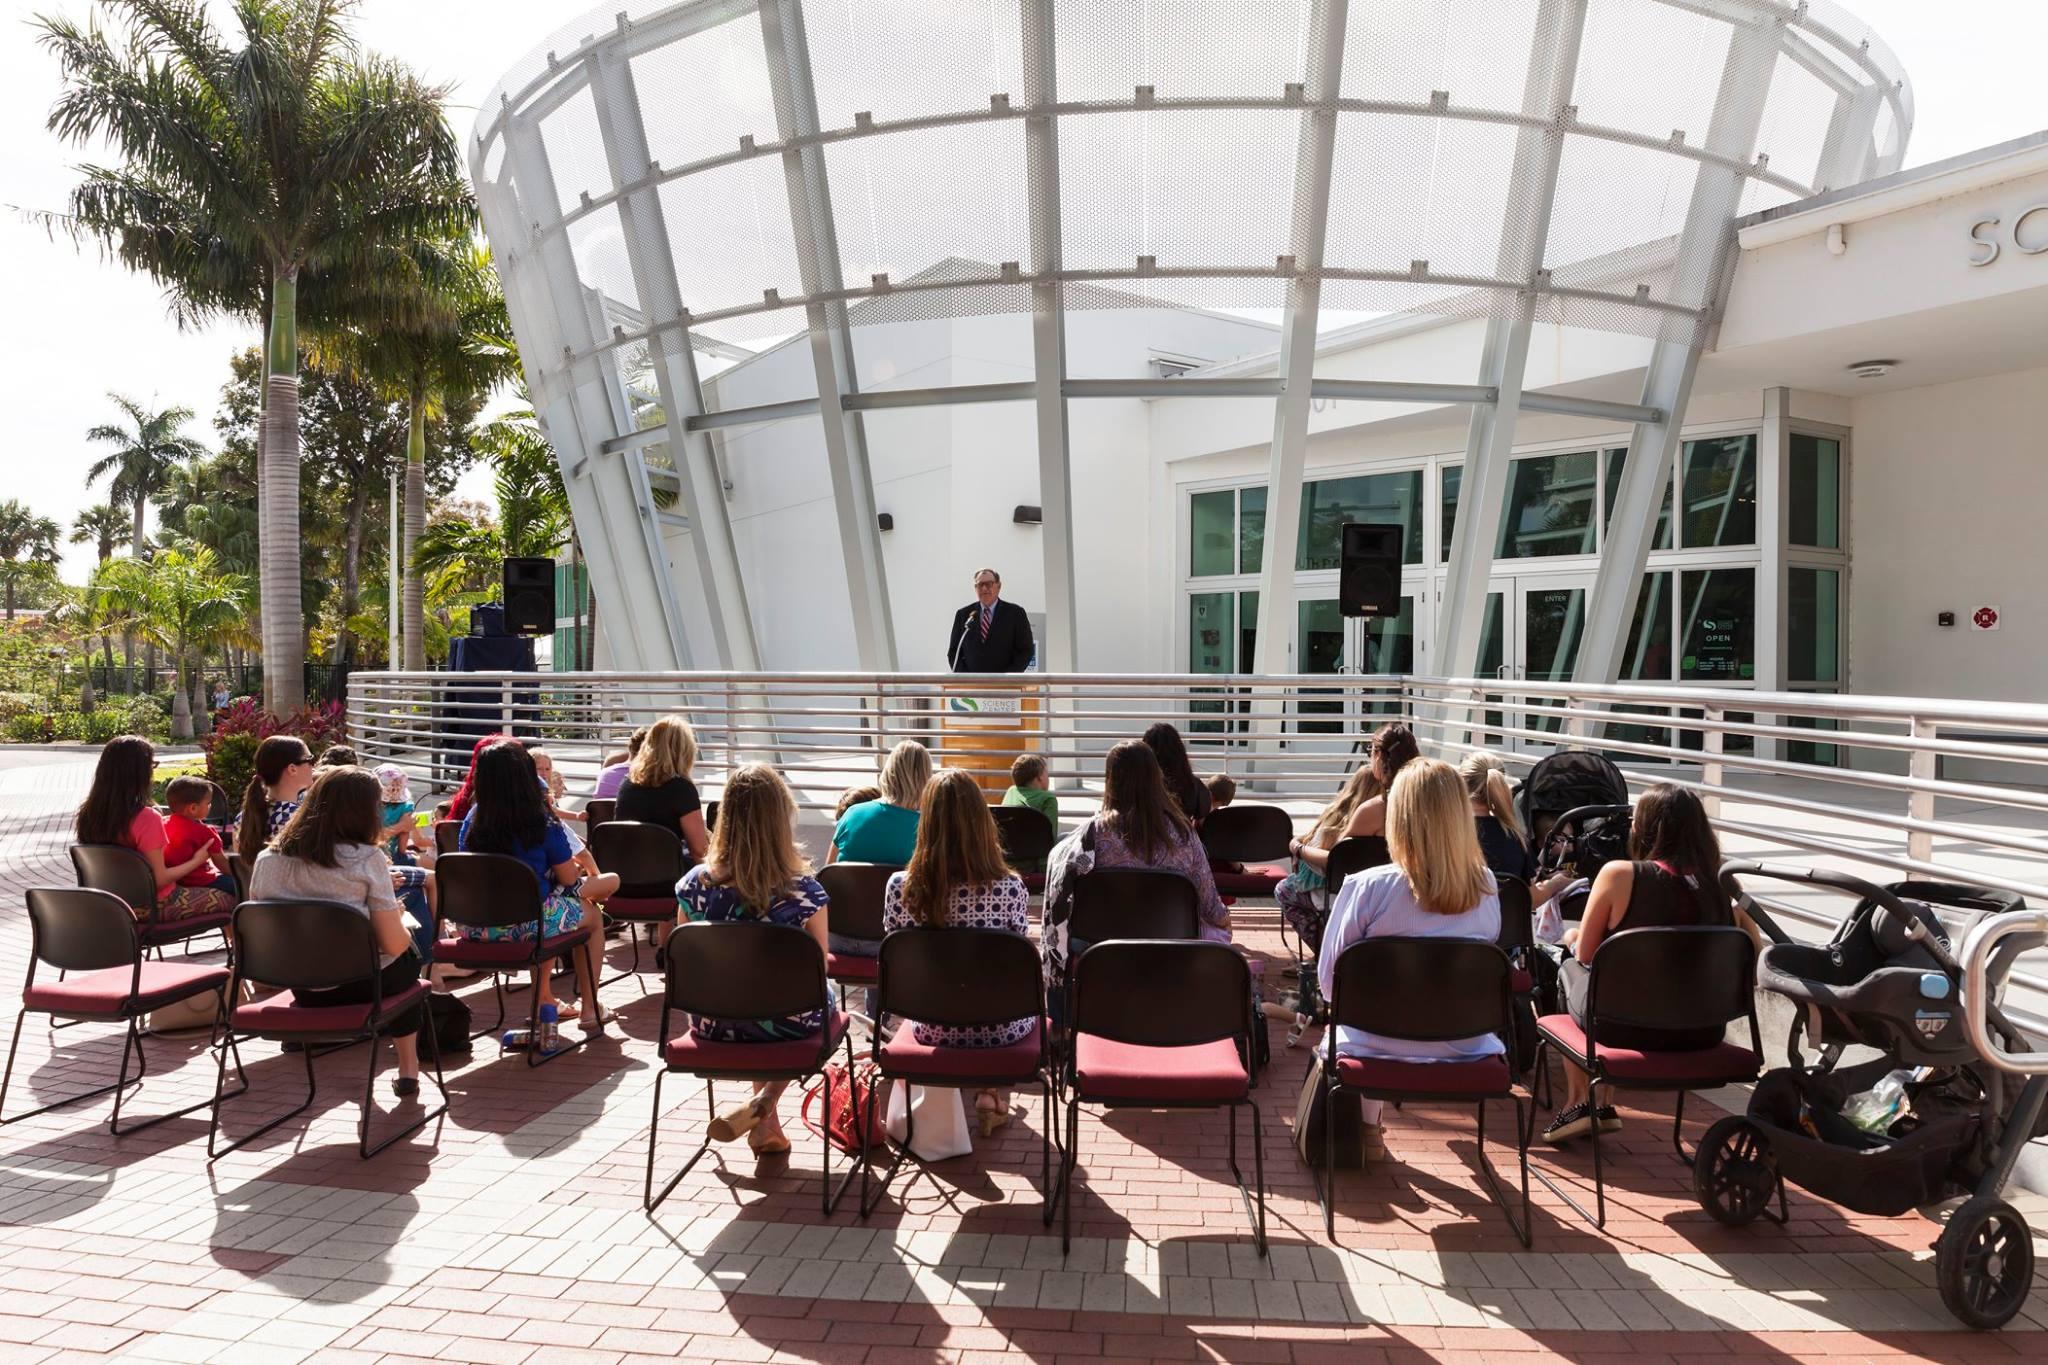 South Florida Science Center and Aquarium Positively